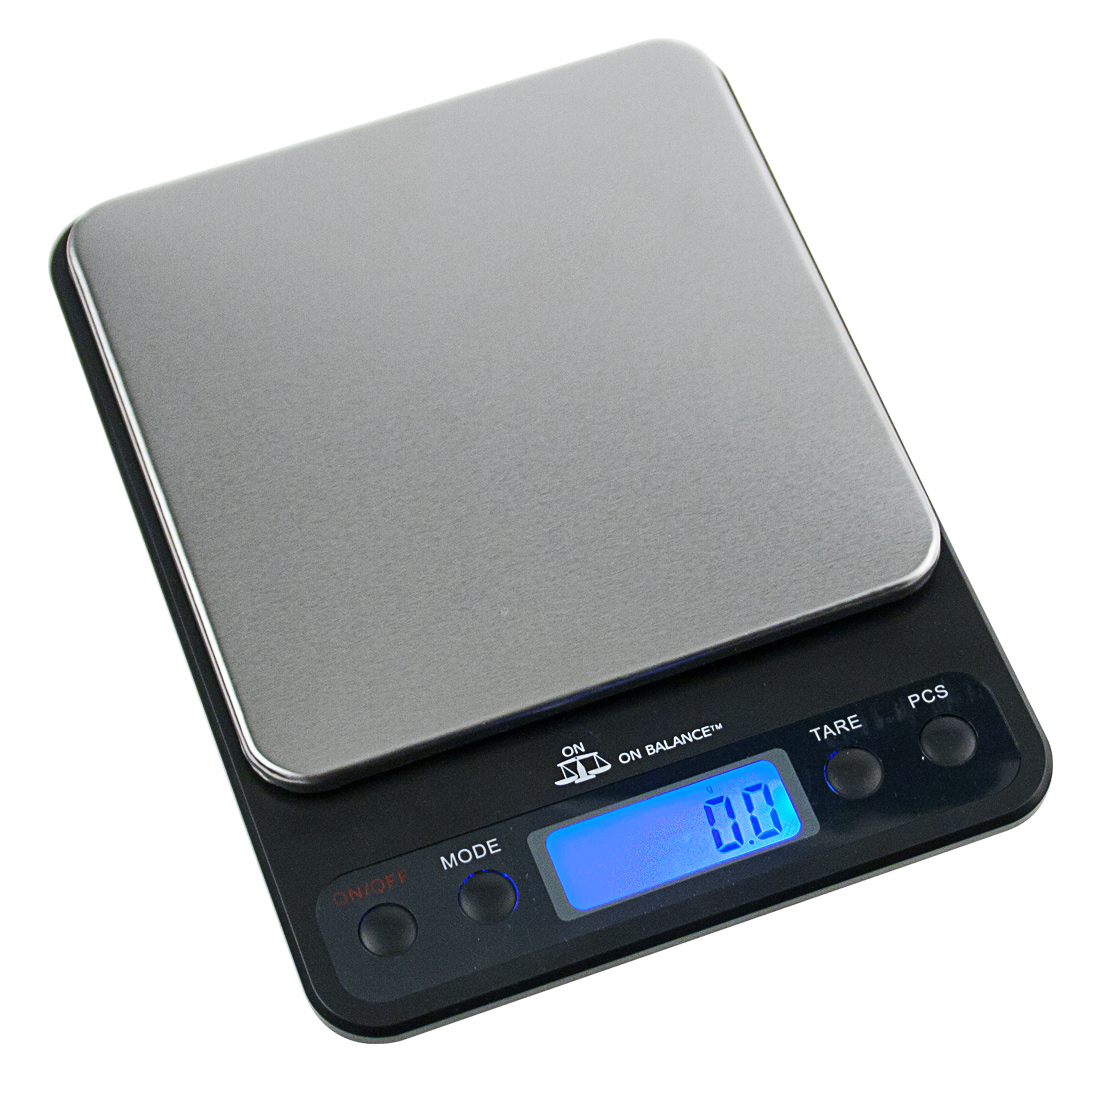 balance cuisine 3kg balance table acheter balance de poche 0 1g. Black Bedroom Furniture Sets. Home Design Ideas